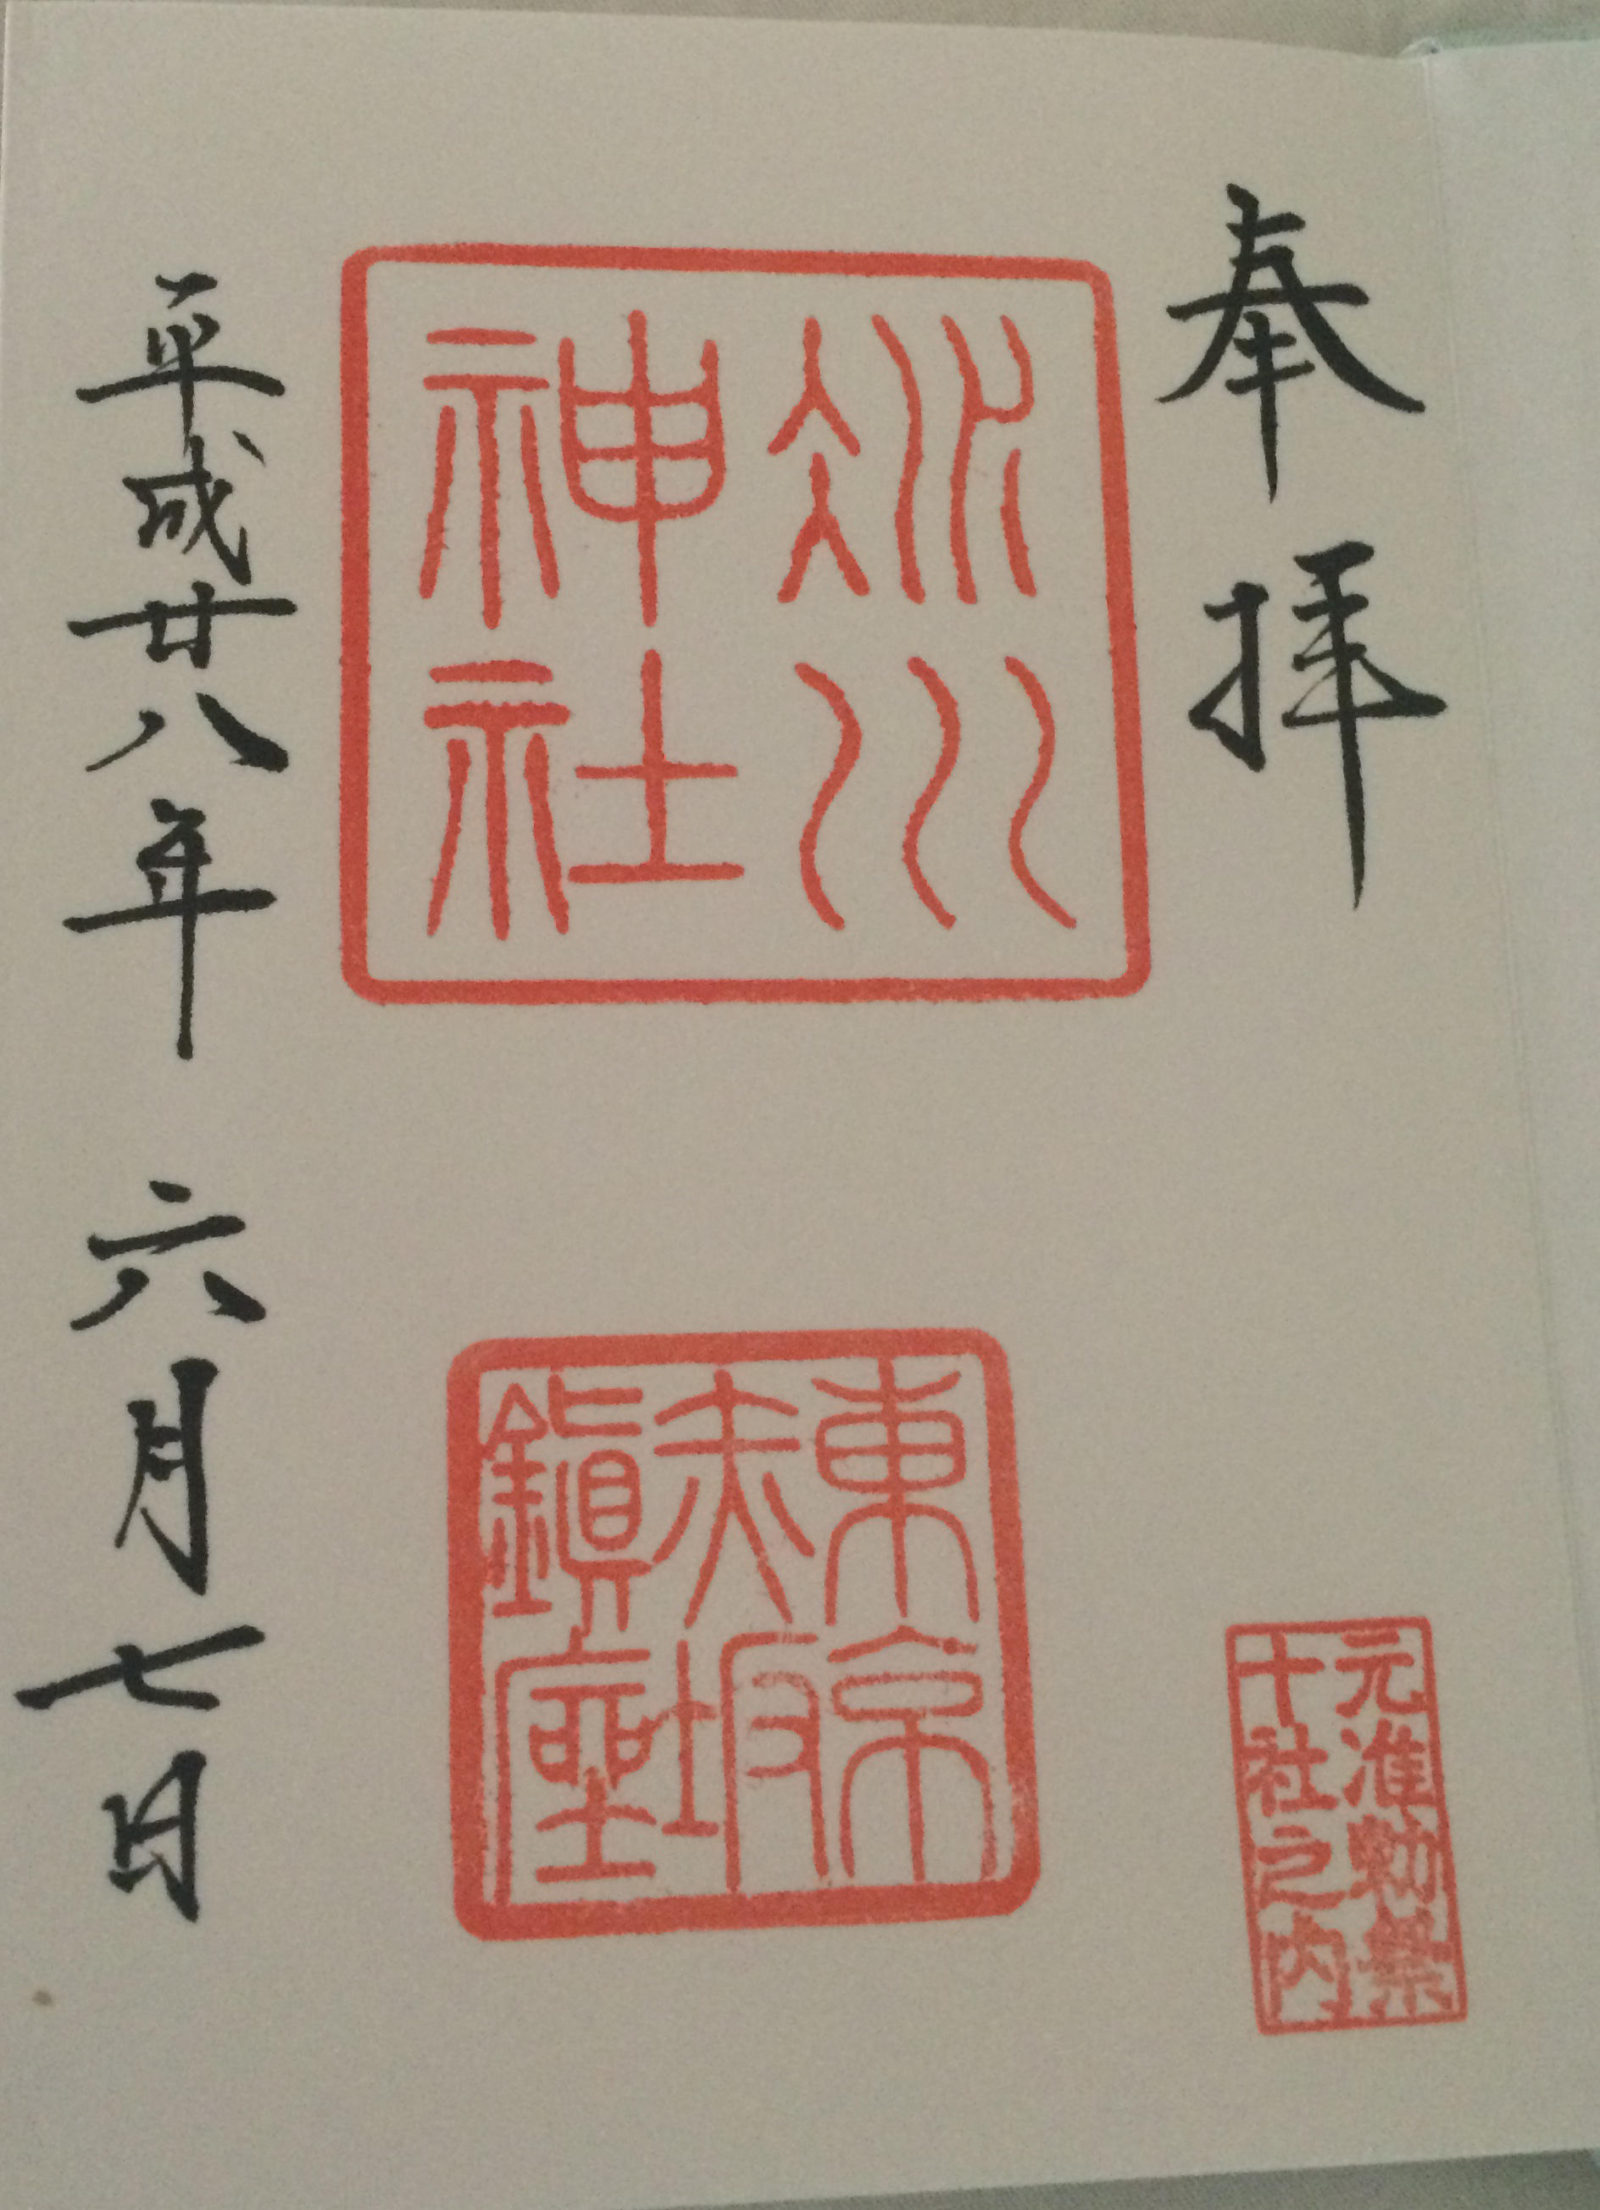 Goshuin(shrine seal) from Hikawa Jinja.